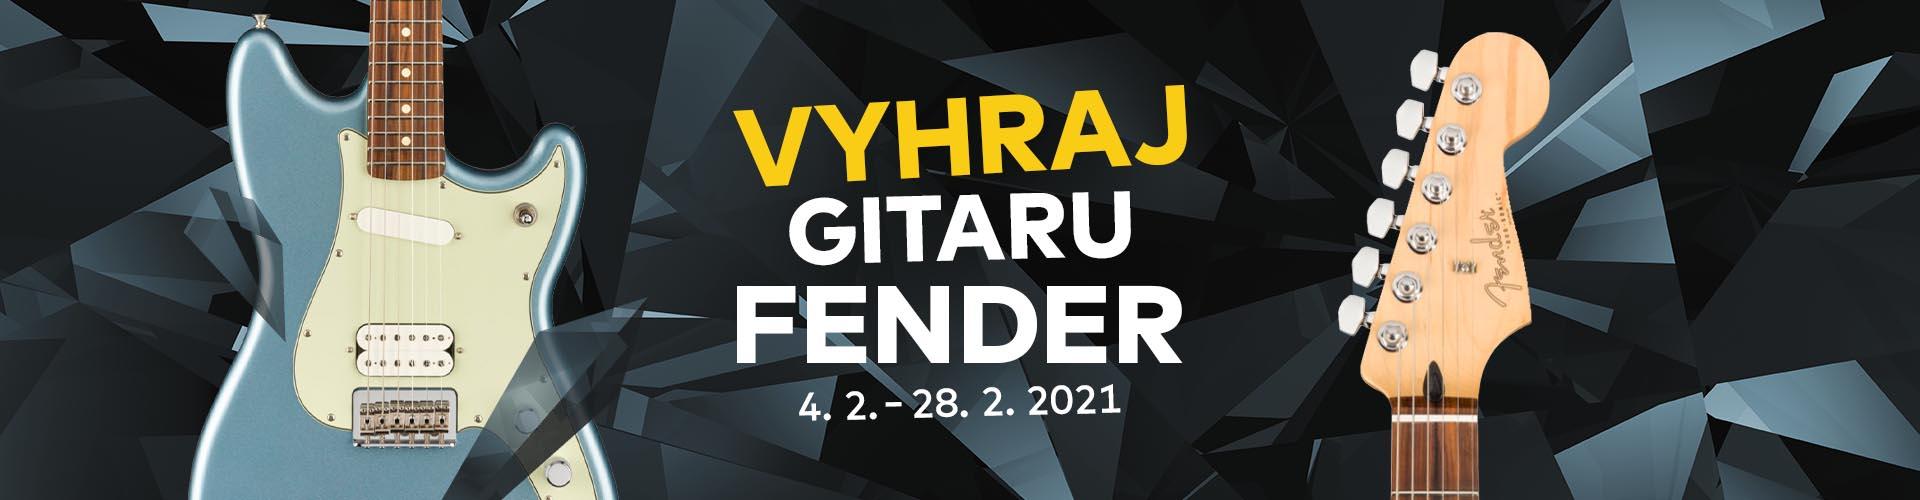 https://mzkrnls.b-cdn.net/2021-01-fender-sutaz/lp/MRK-1920-Fender-LP-sk.jpg